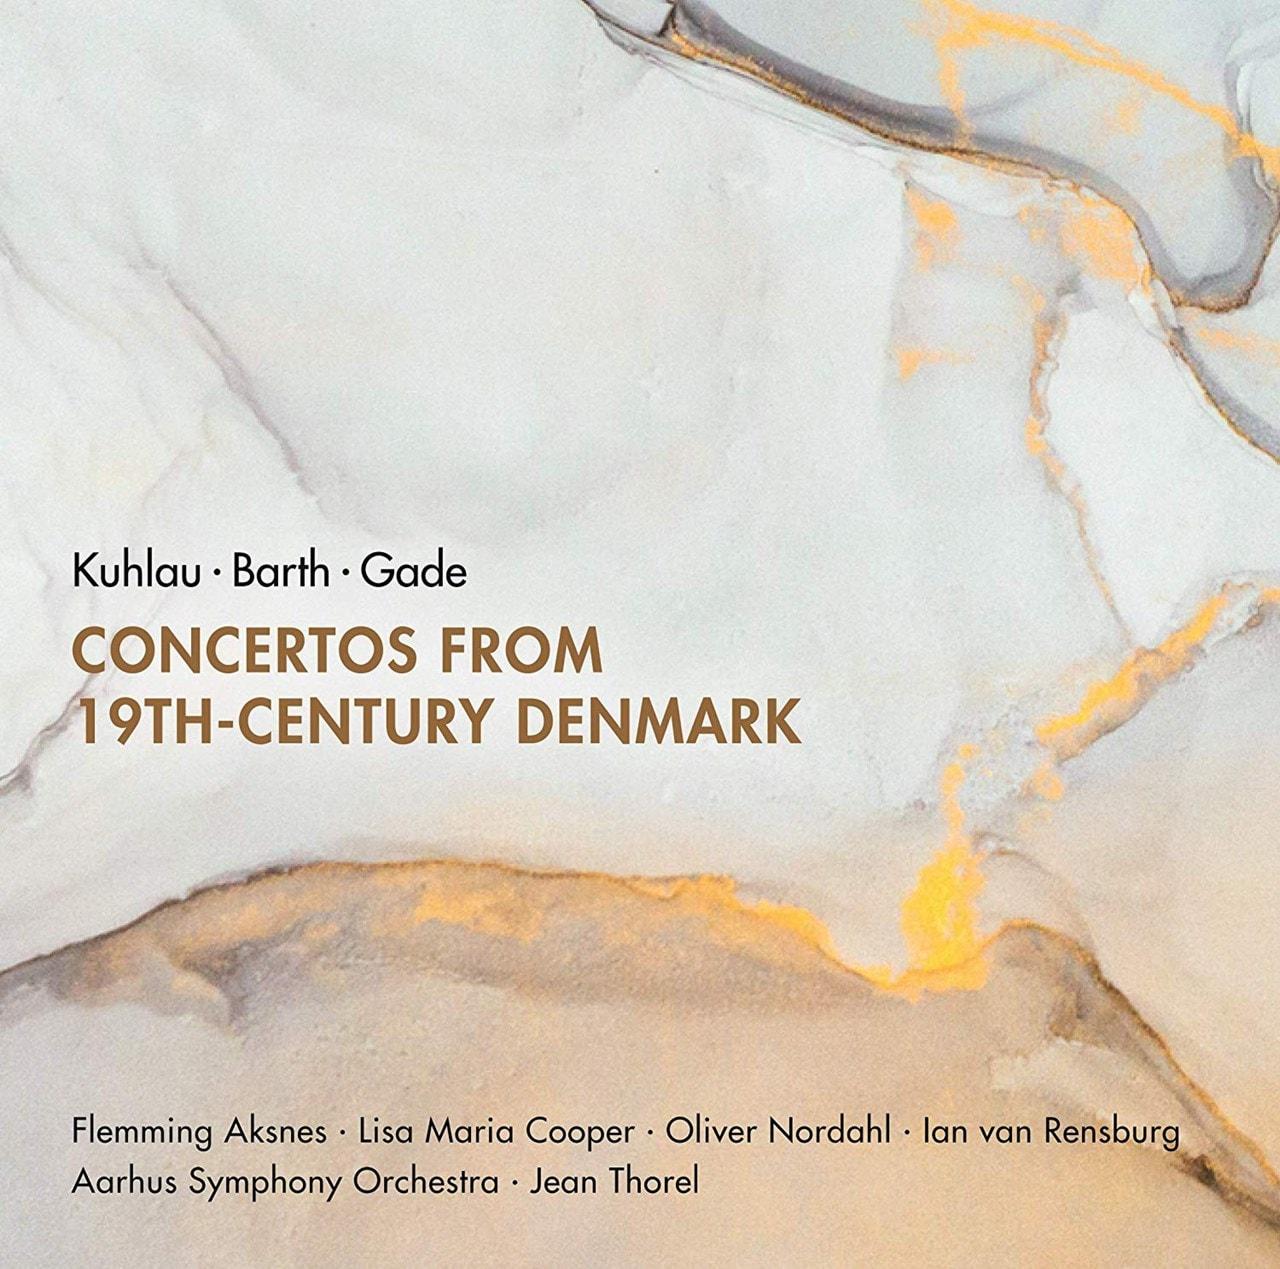 Kuhlau/Barth/Gade: Concertos from 19th-century Denmark - 1